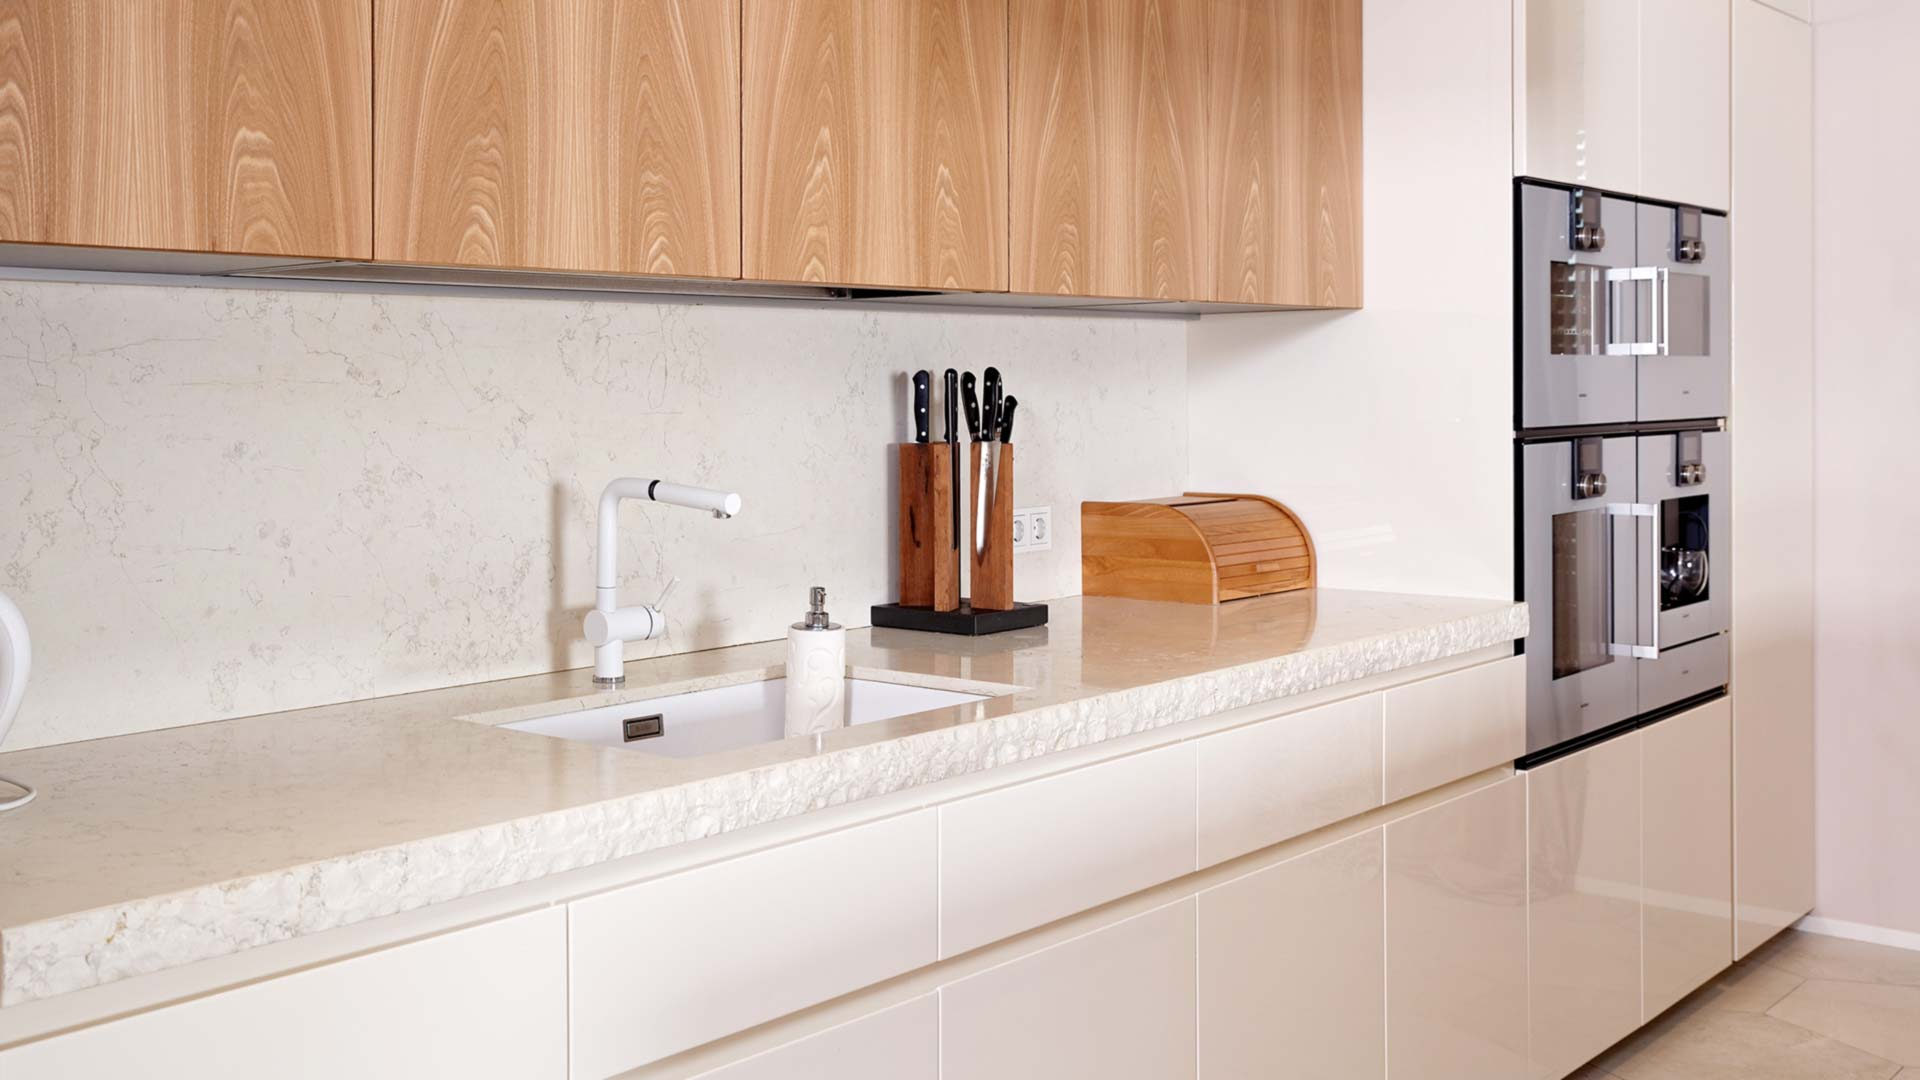 Cucina in pietra e olmo con isola freestanding in pietra - Cucina freestanding ...